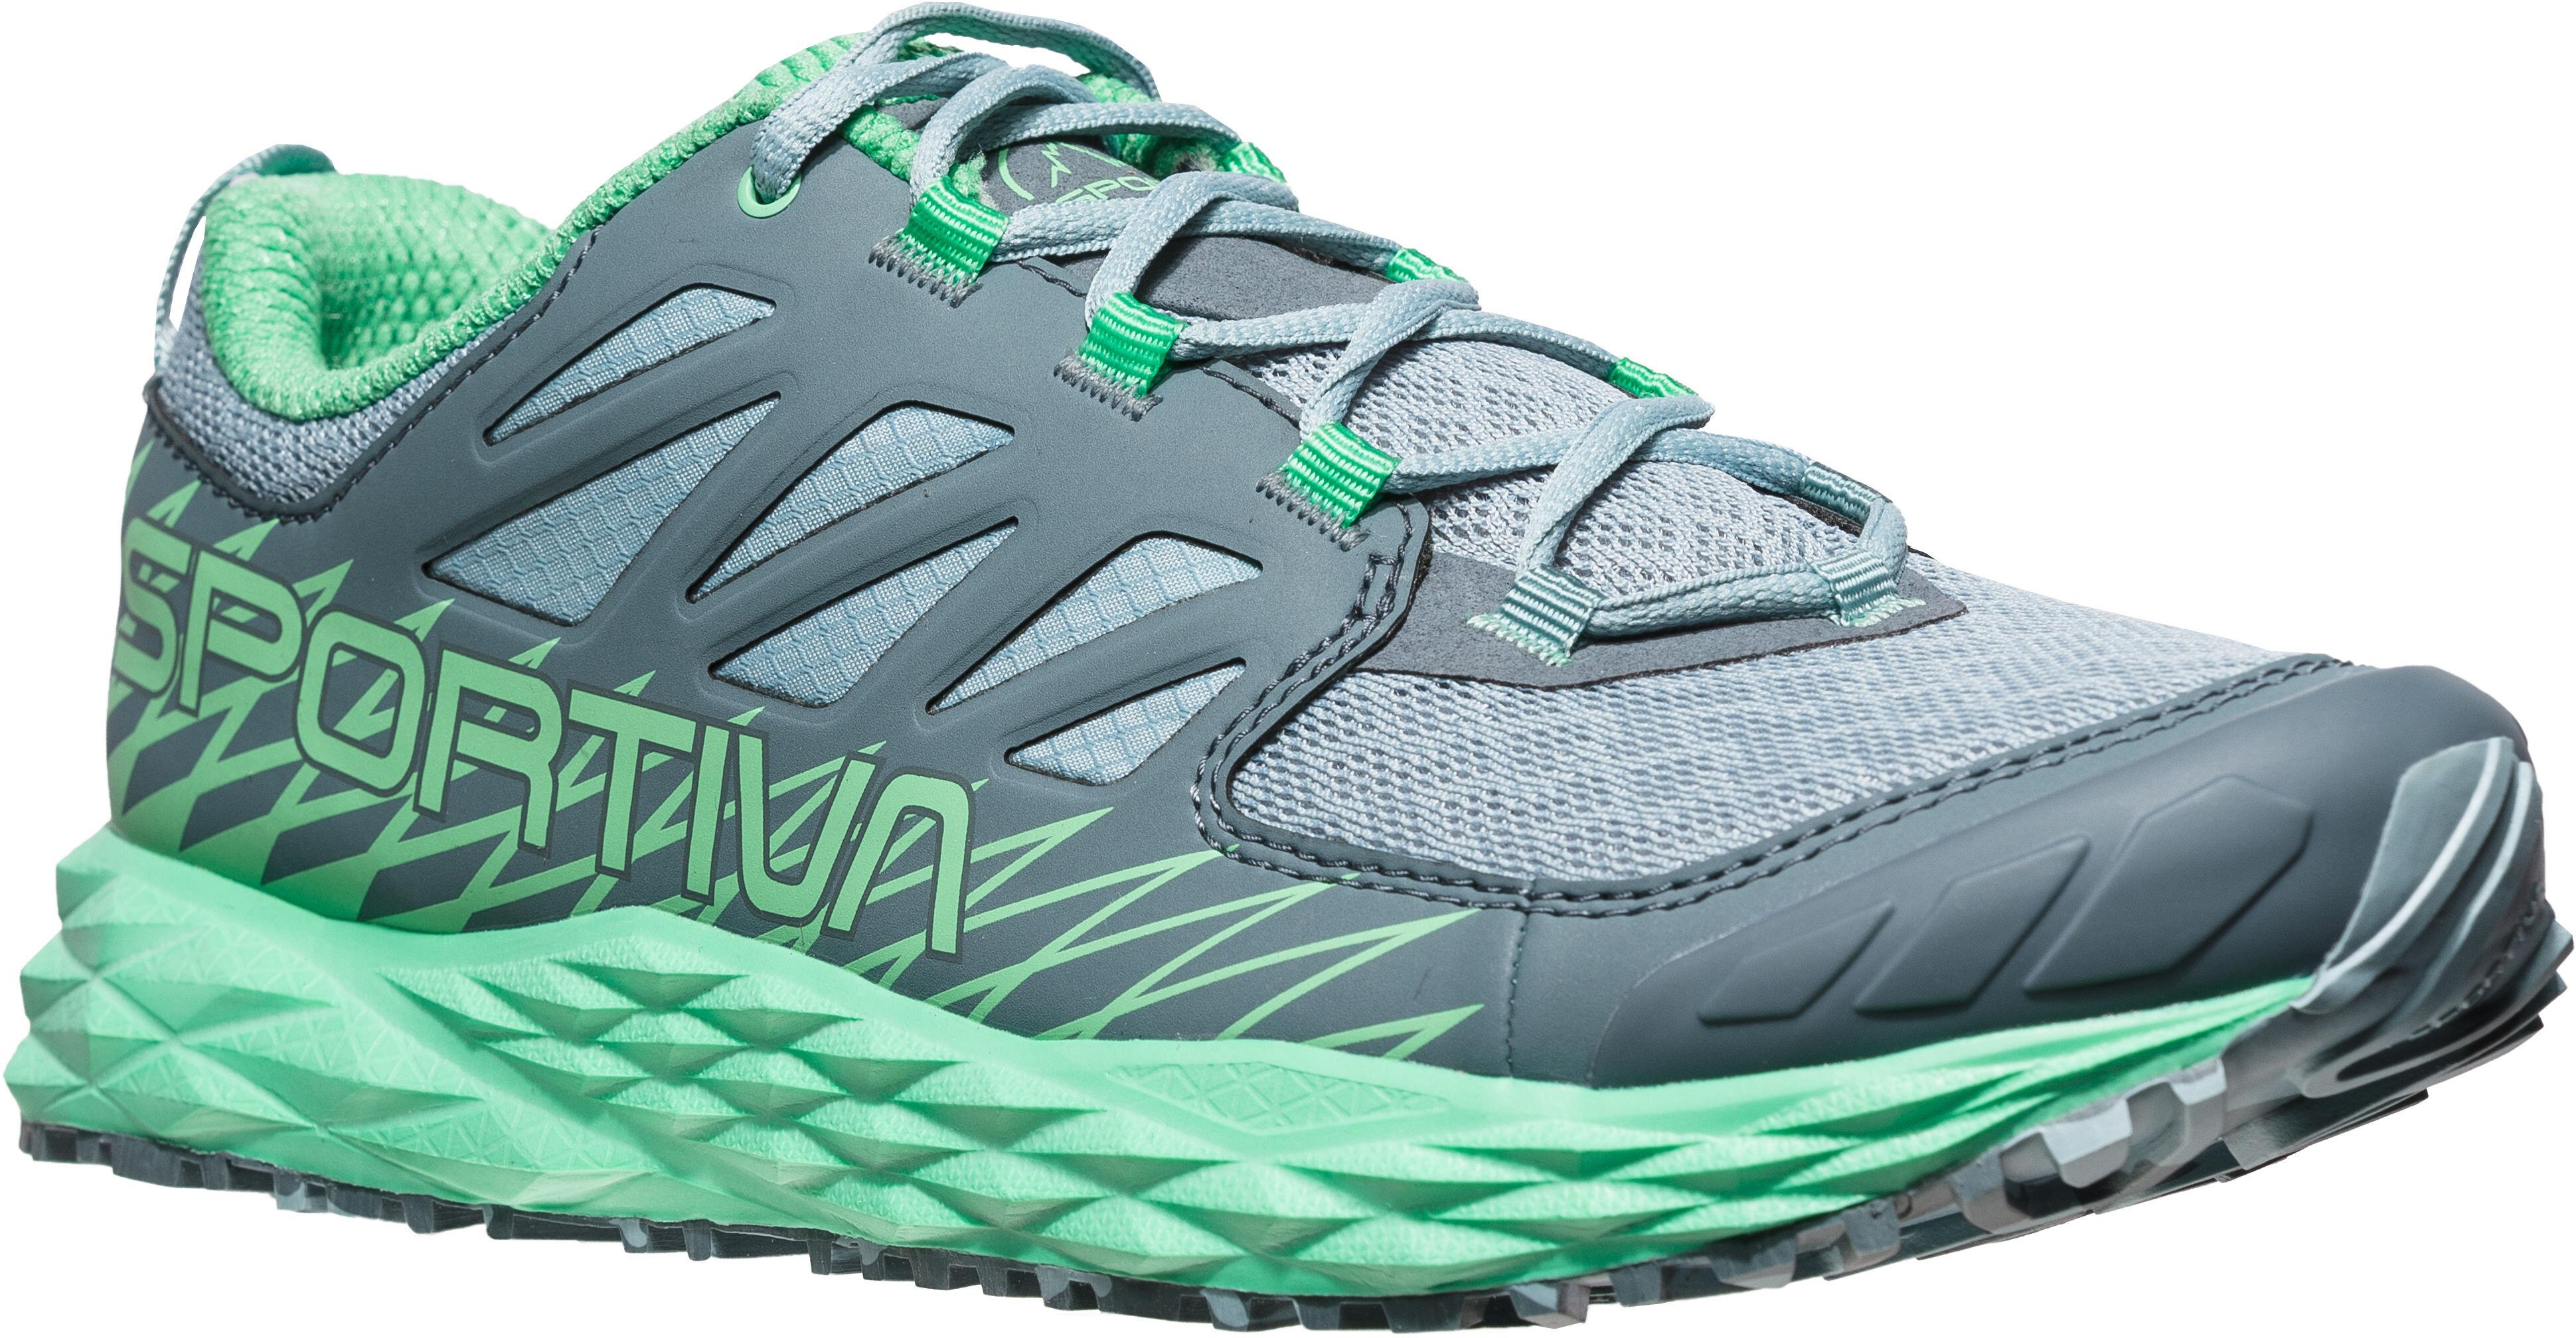 be0d50f55ce60 La Sportiva Lycan - Zapatillas running Mujer - gris Turquesa